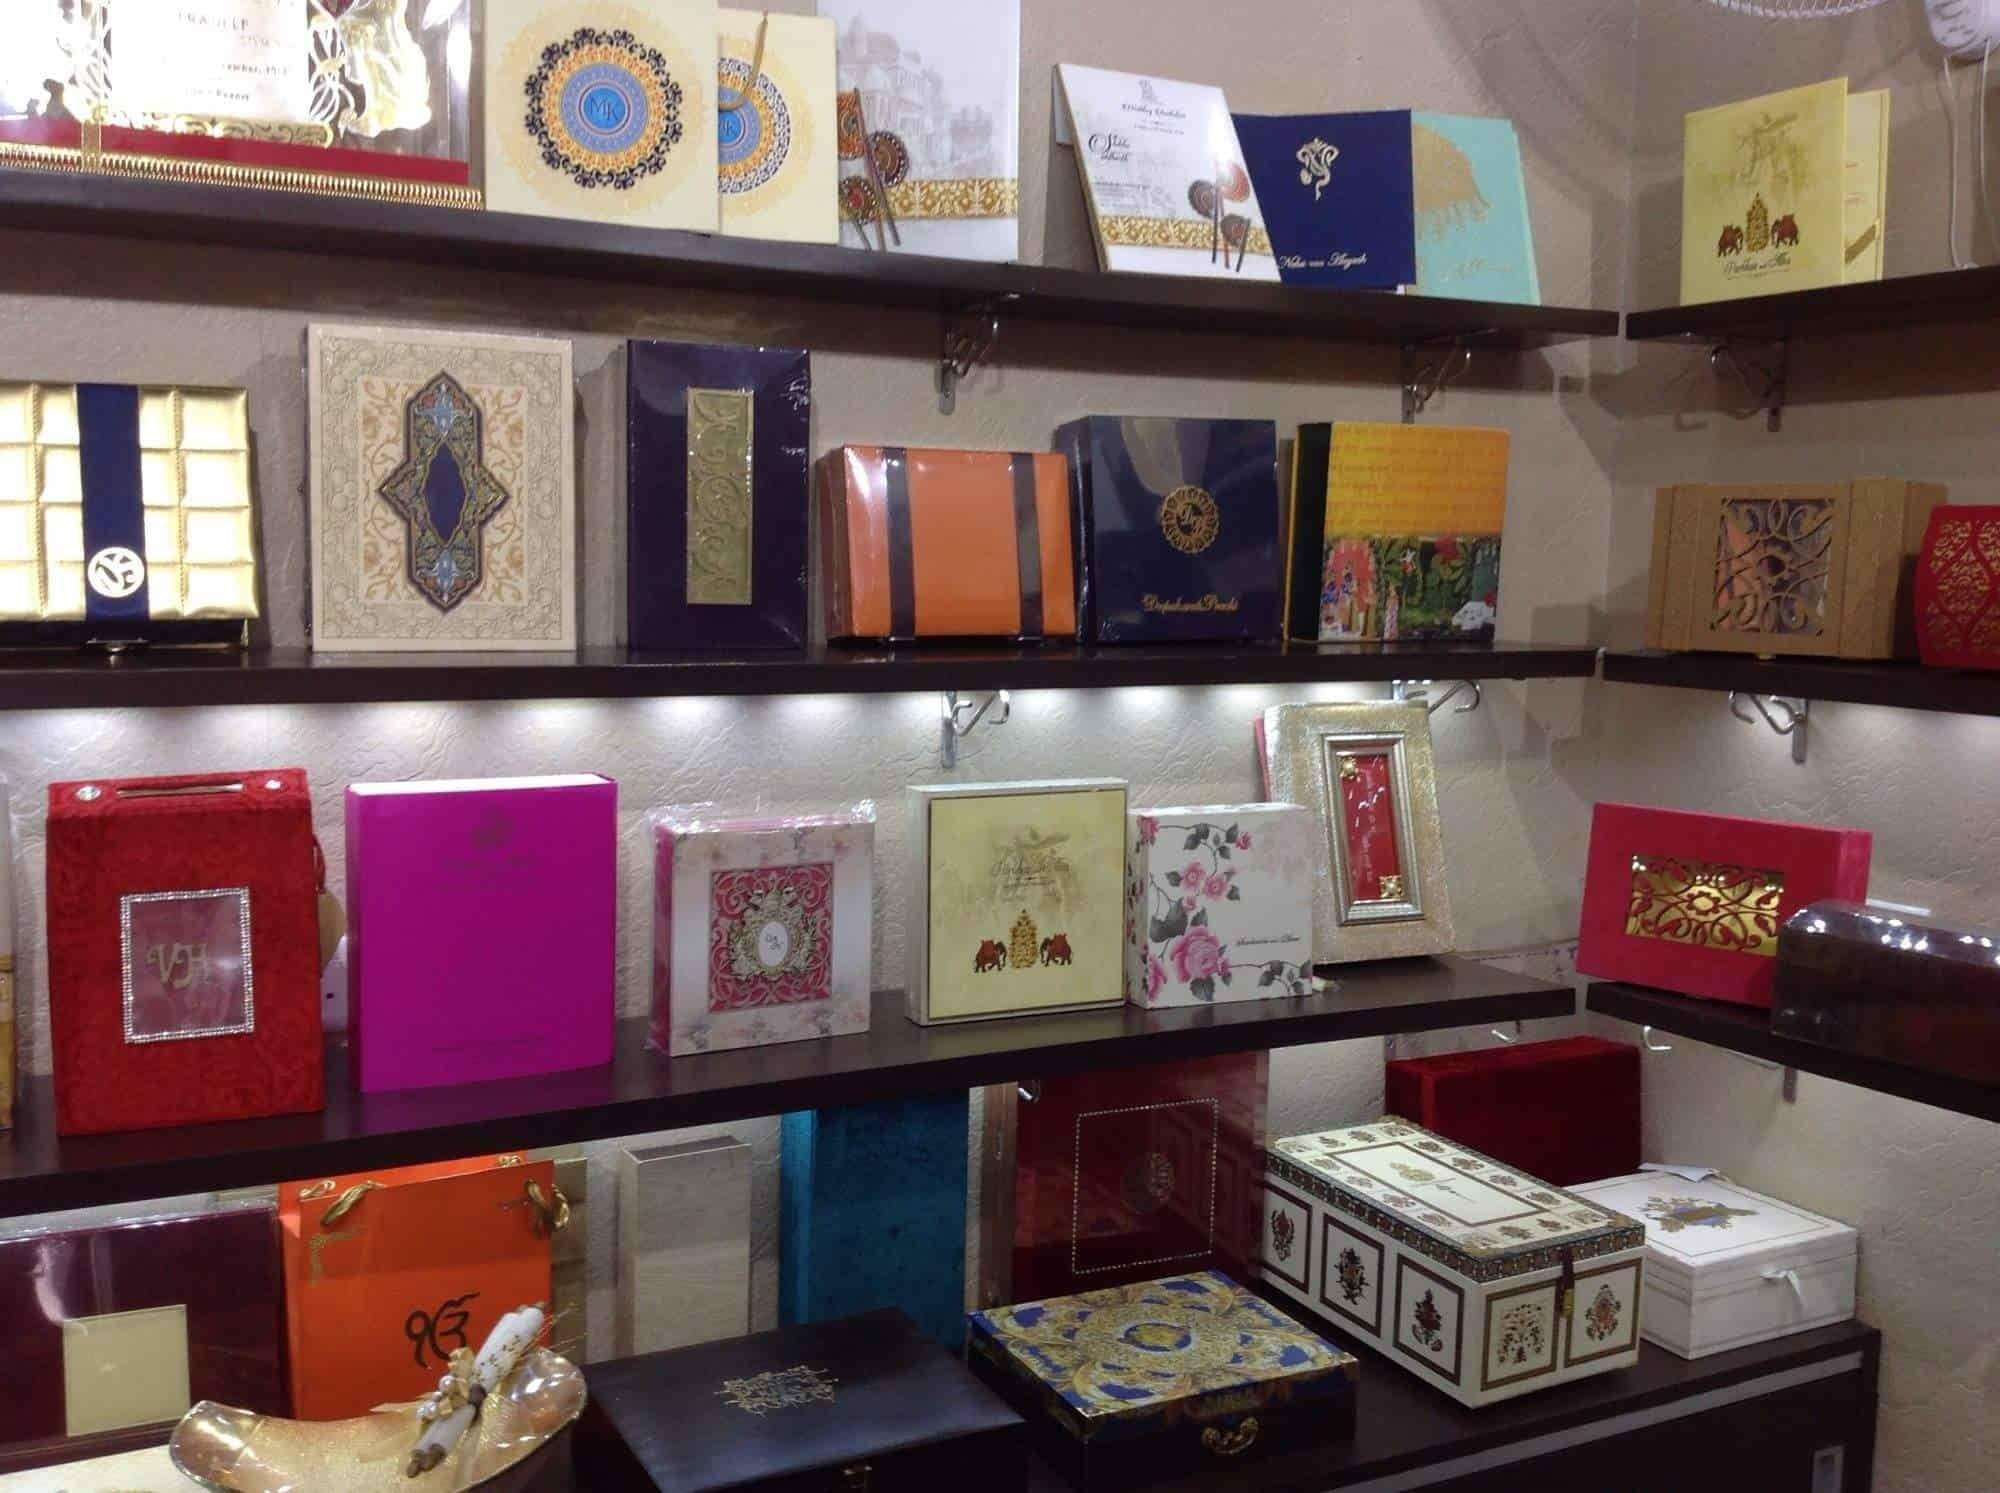 Sajawat invitations ashok vihar wedding card printers in delhi sajawat invitations ashok vihar wedding card printers in delhi justdial stopboris Gallery